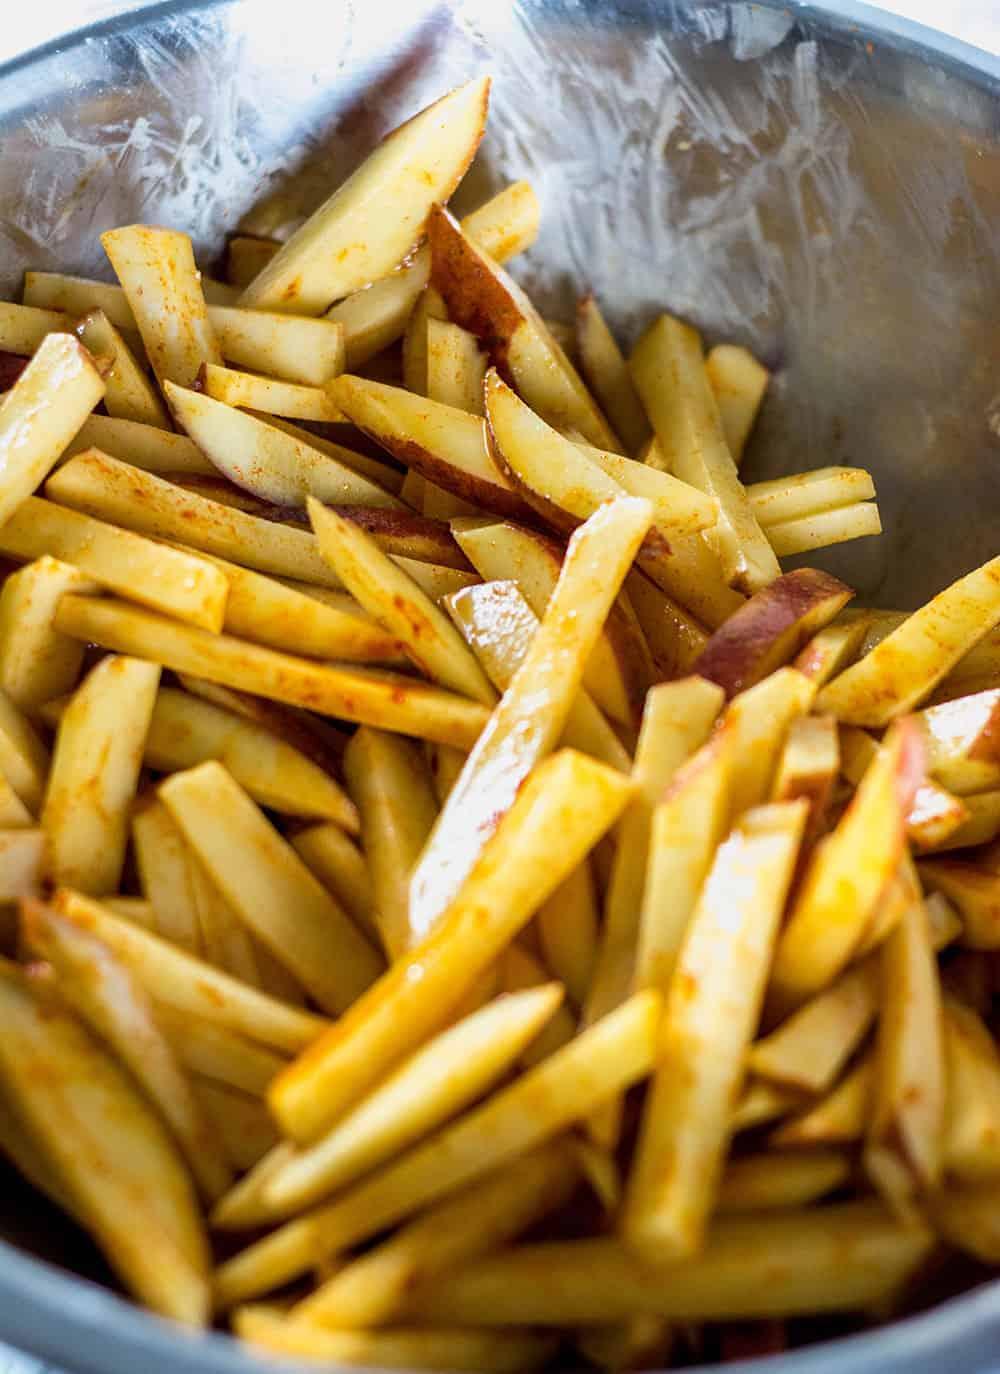 Vegan Pinto Bean Chili Cheese Fries, seasoned fries in a bowl